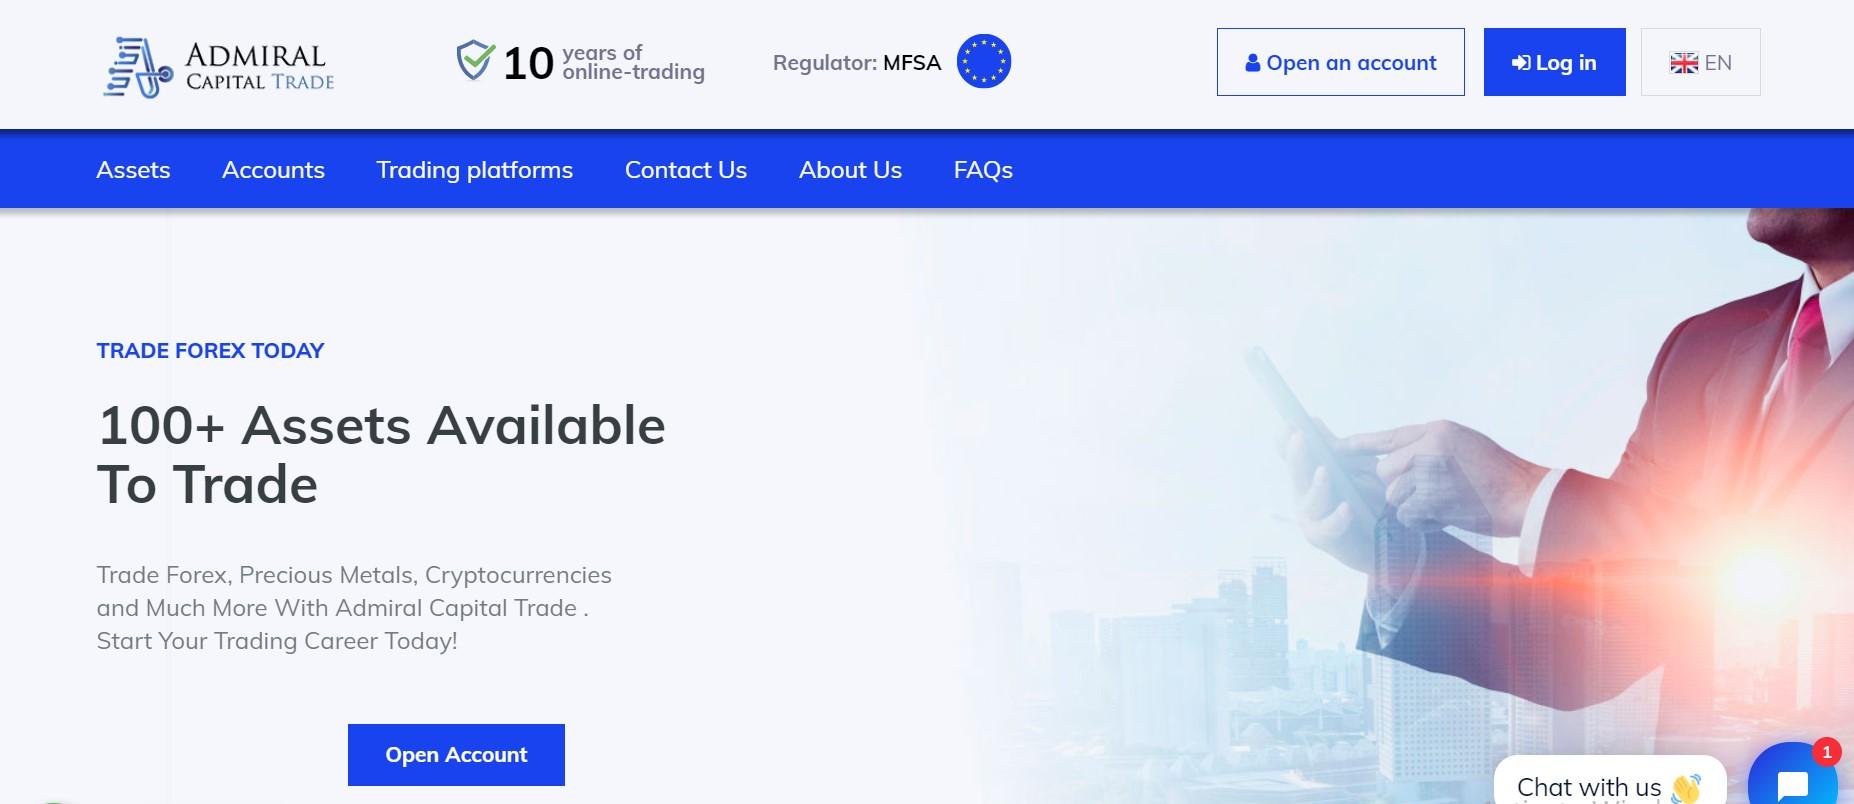 Admiral Capital Trade website